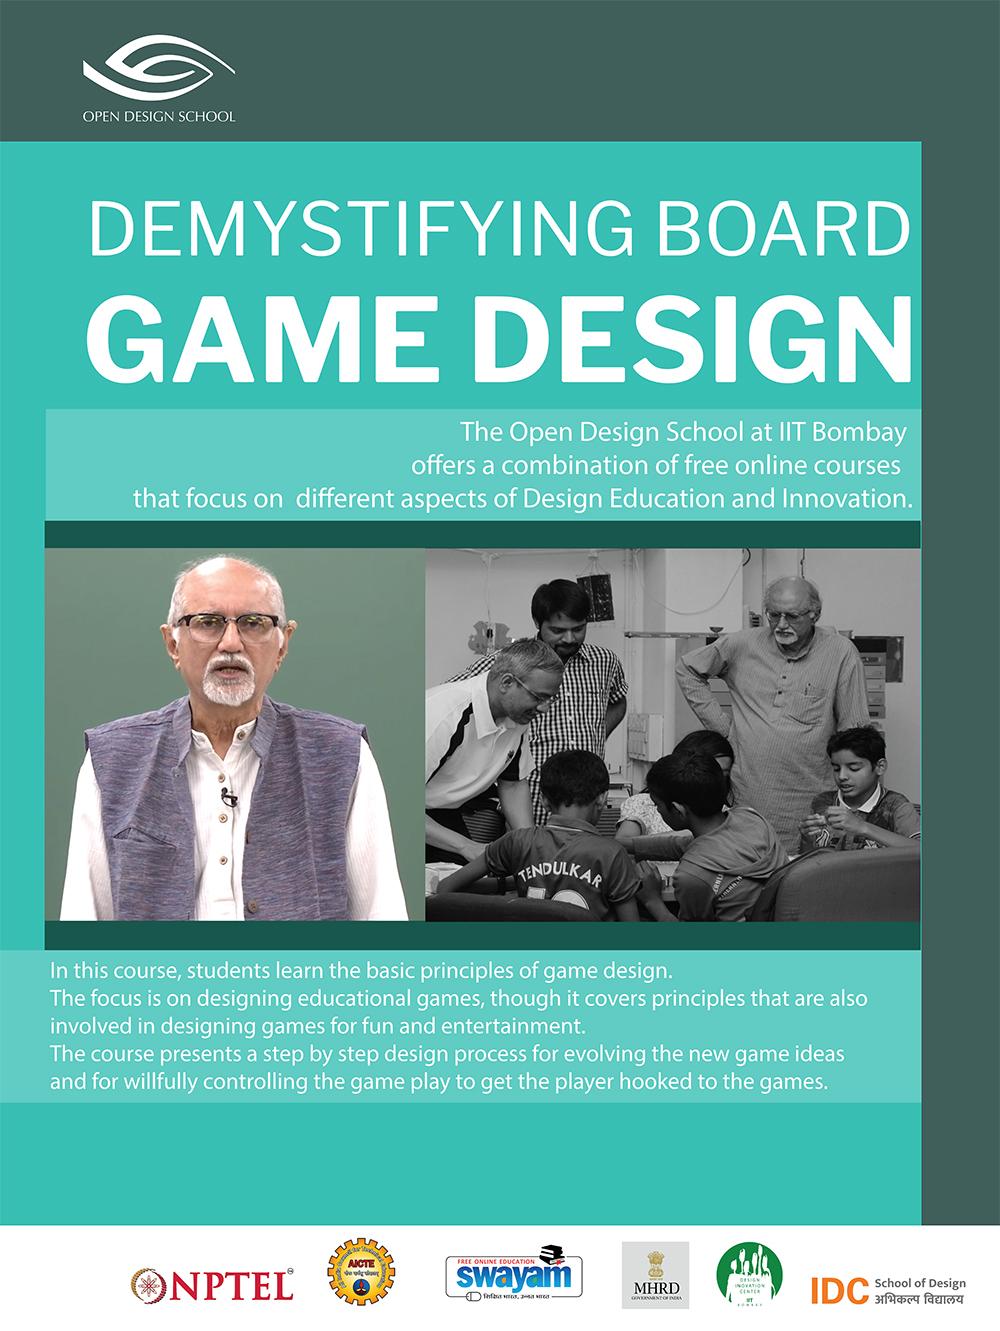 DemystifyingBoardGameDesign.jpg